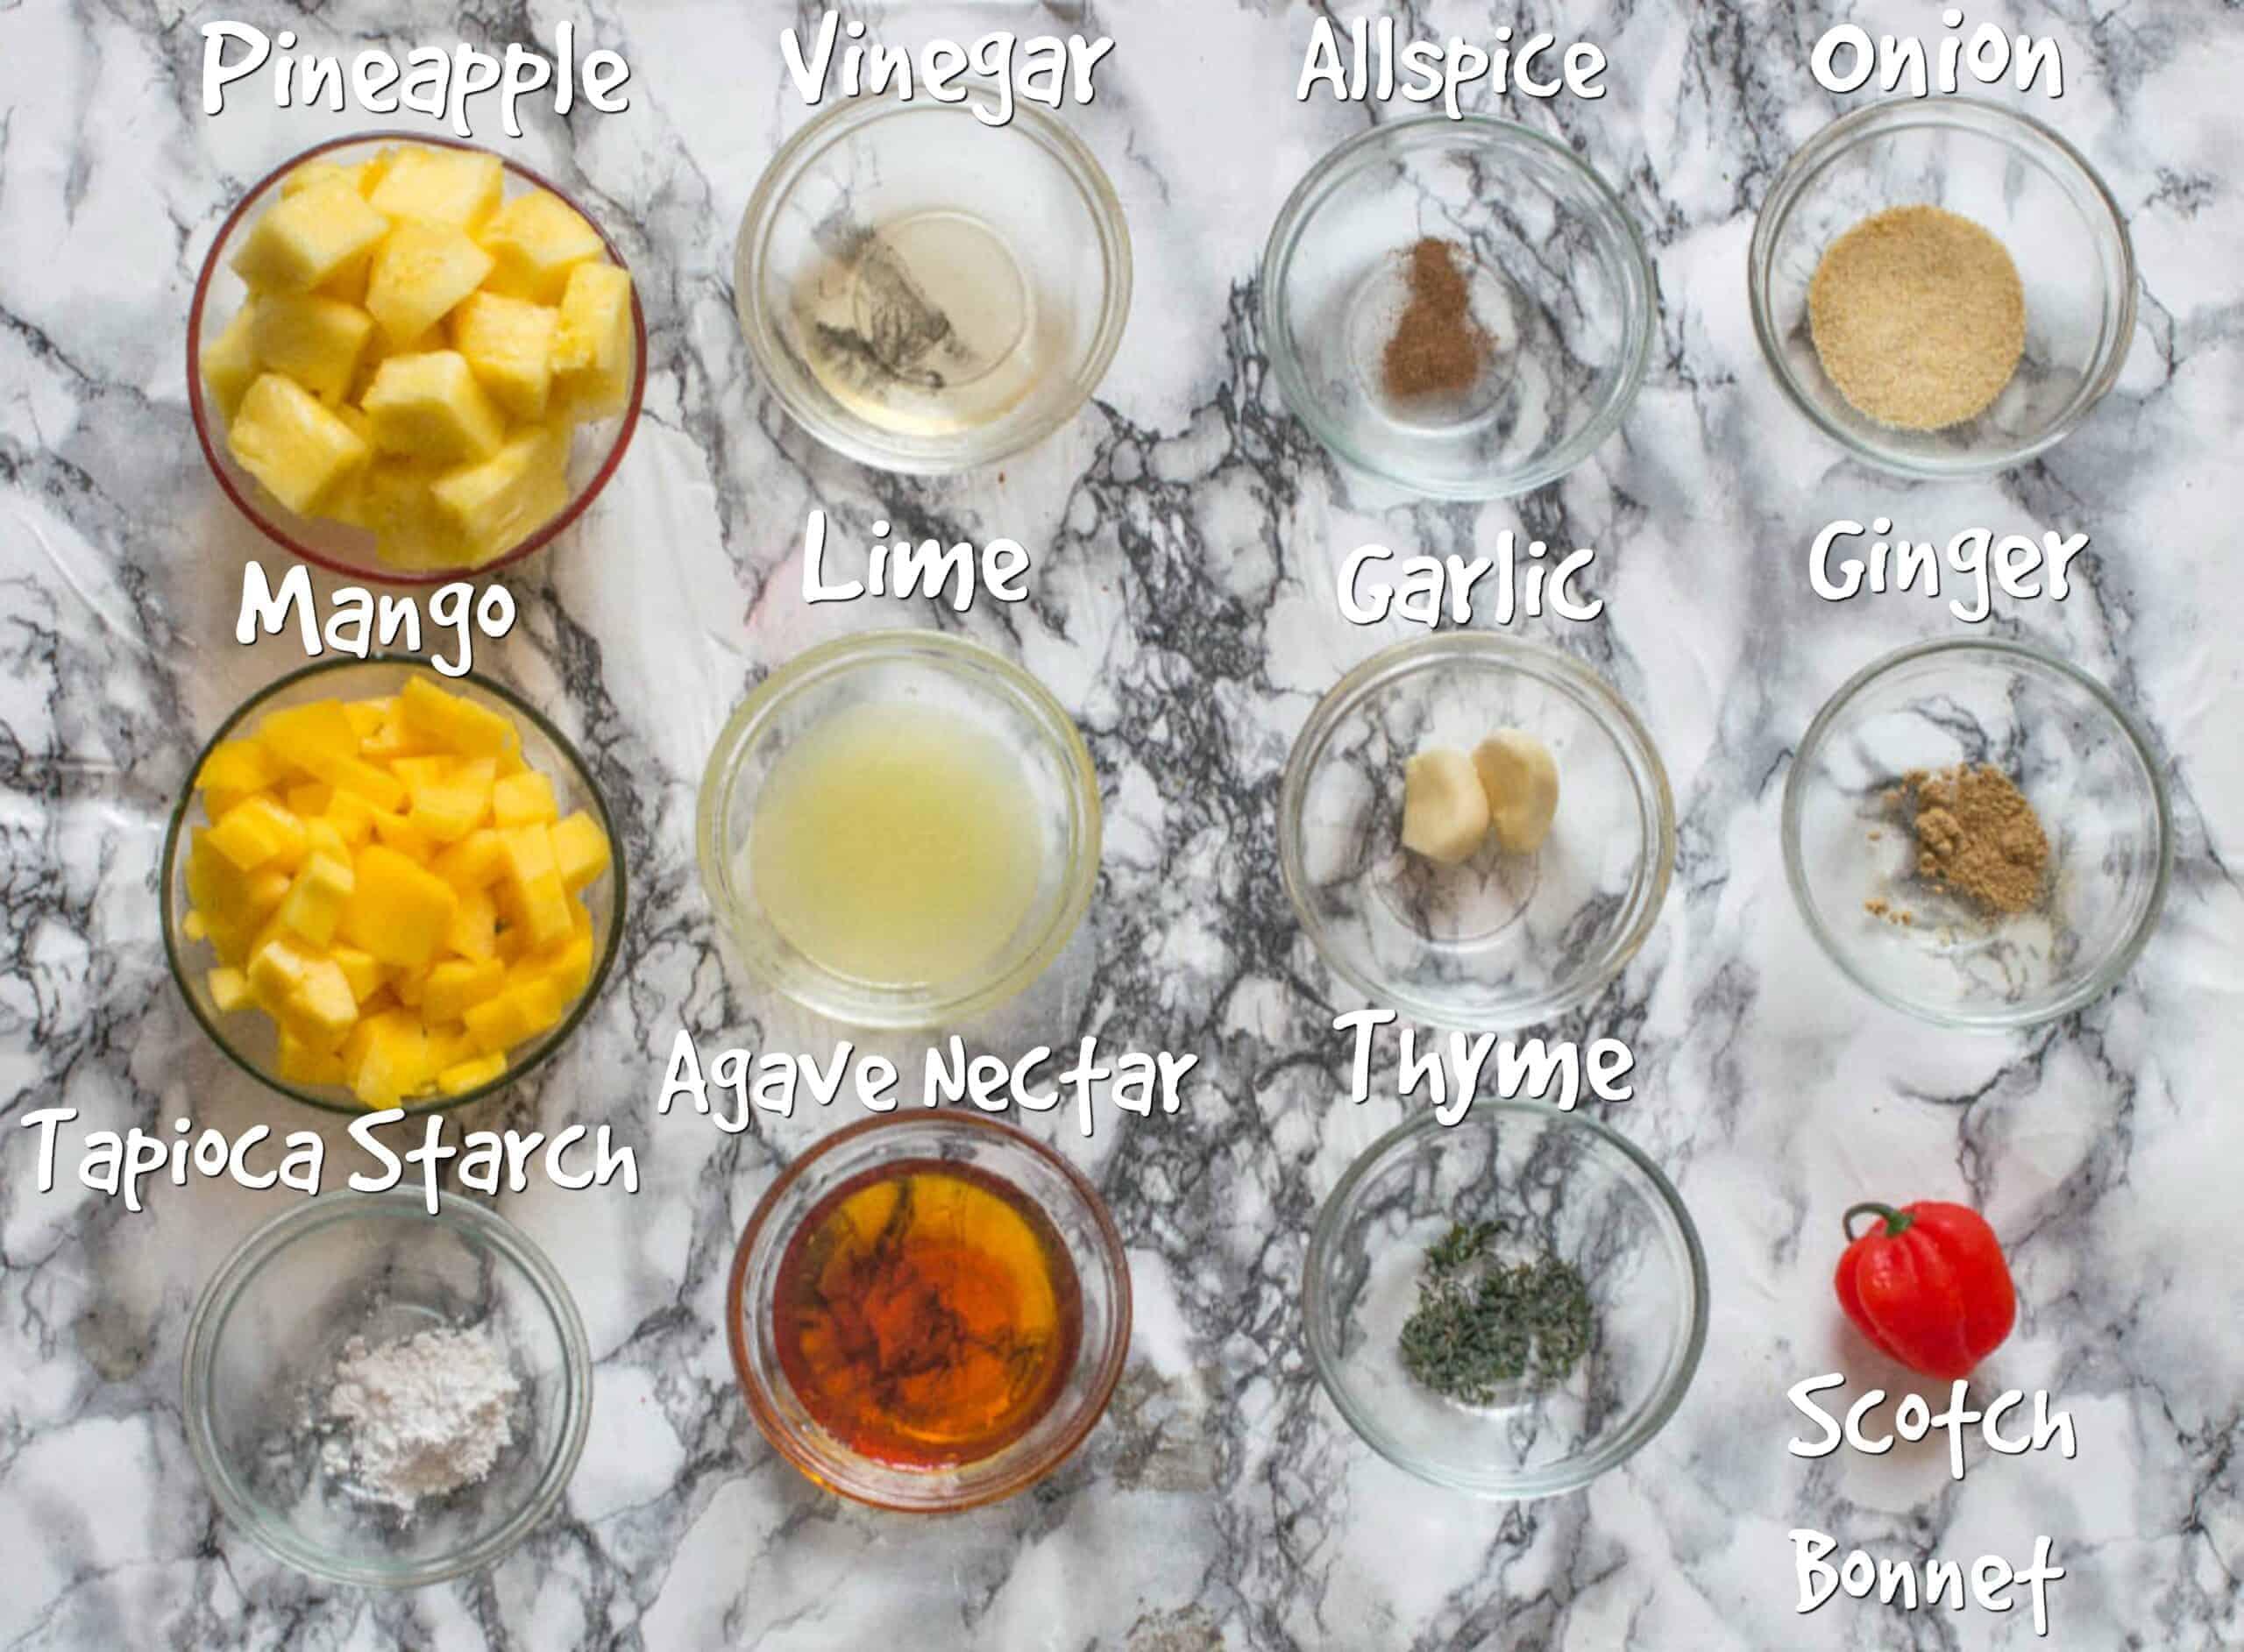 ingredients for mango pineapple hot sauce